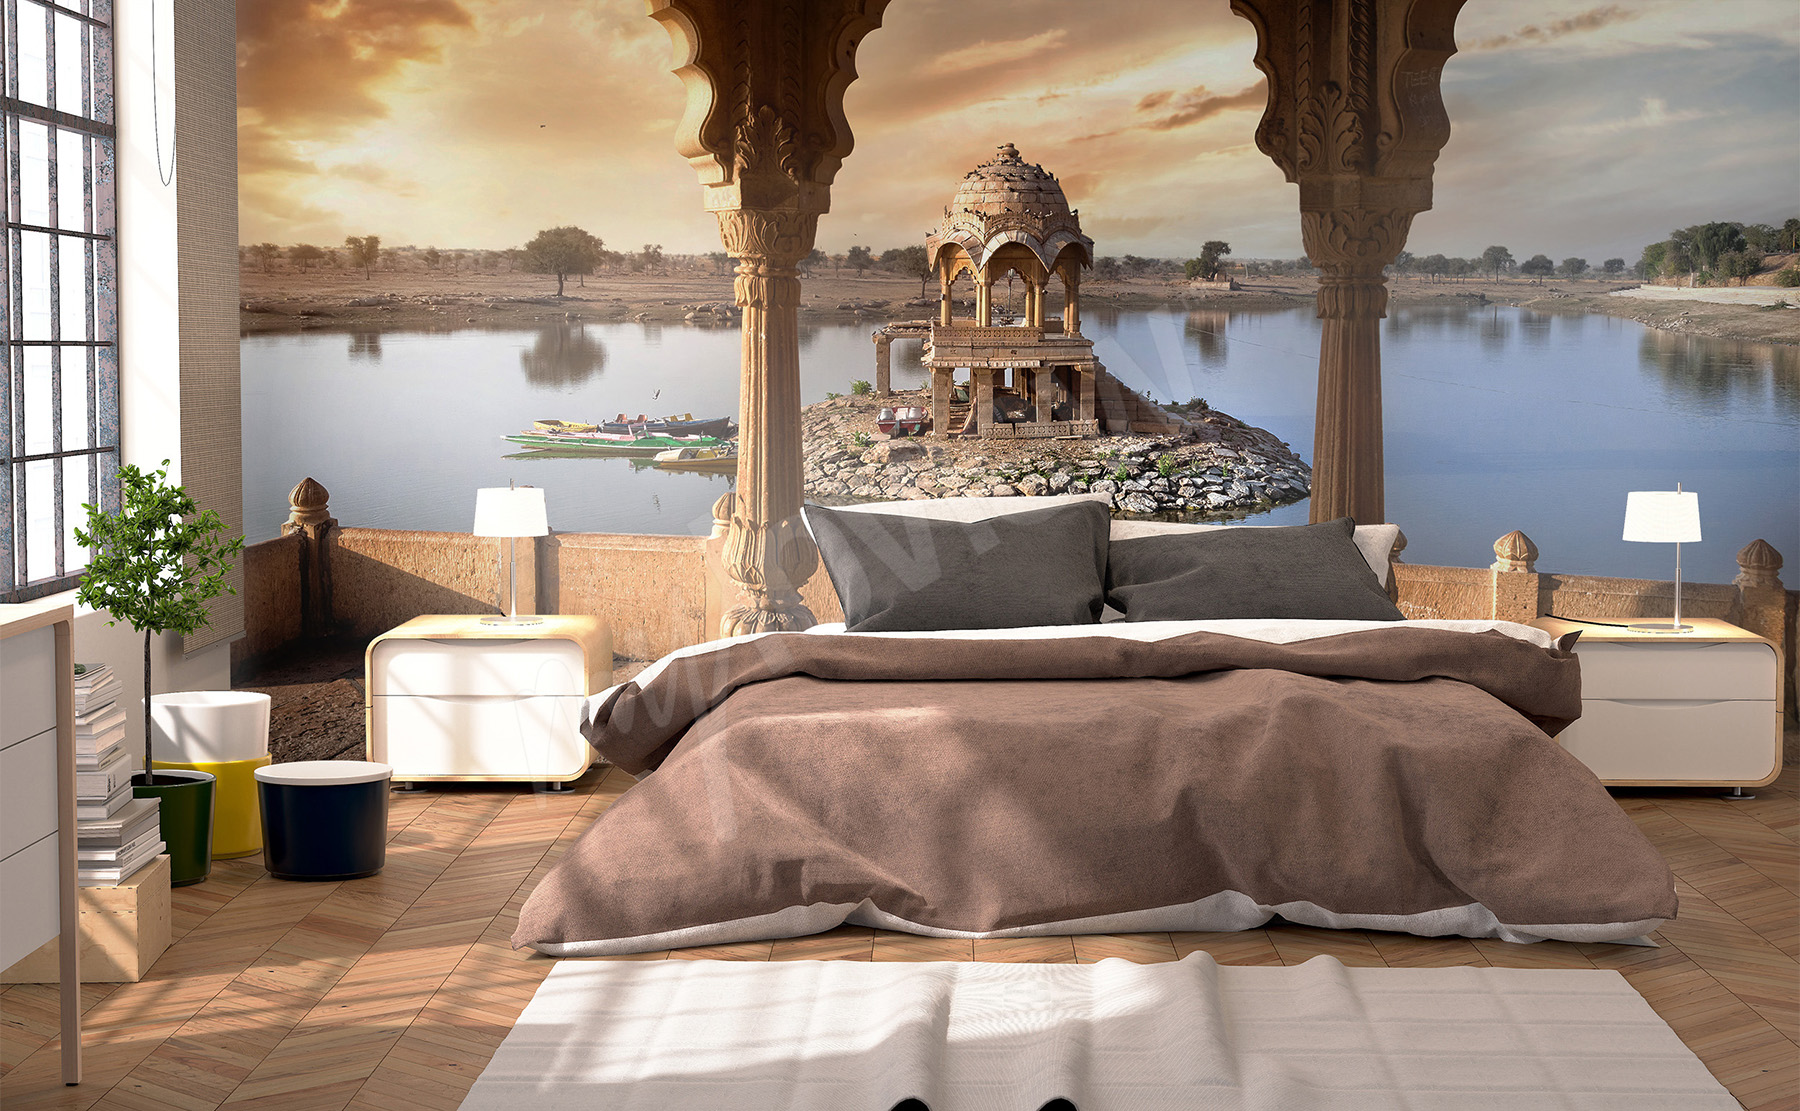 fototapeten nach kategorie st dte fototapete. Black Bedroom Furniture Sets. Home Design Ideas